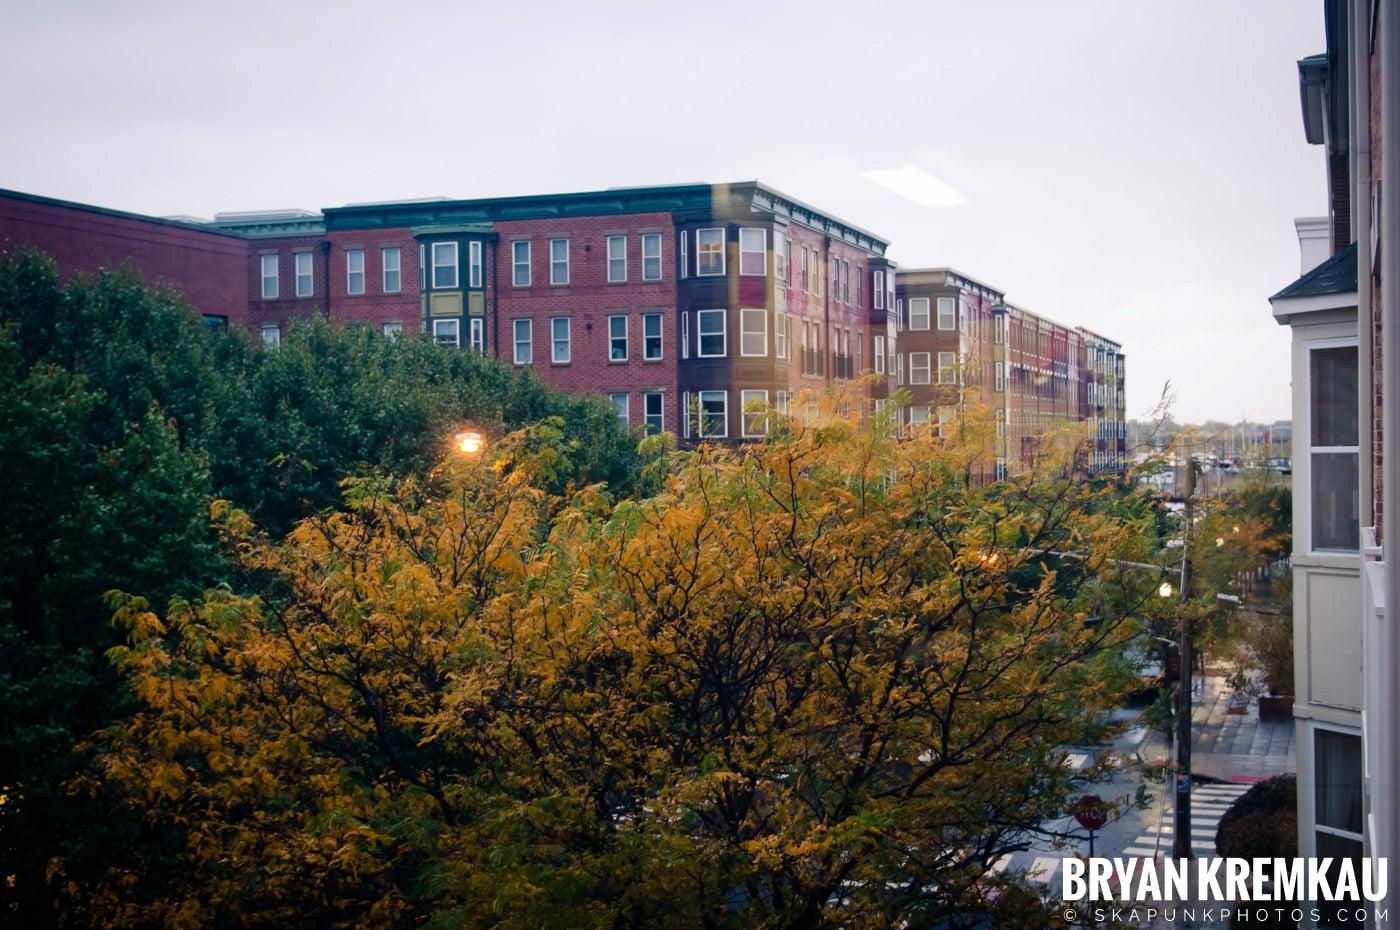 Hurricane Sandy 2012 @ Paulus Hook, Jersey City - 10.29.12 - 10.30.12 (59)